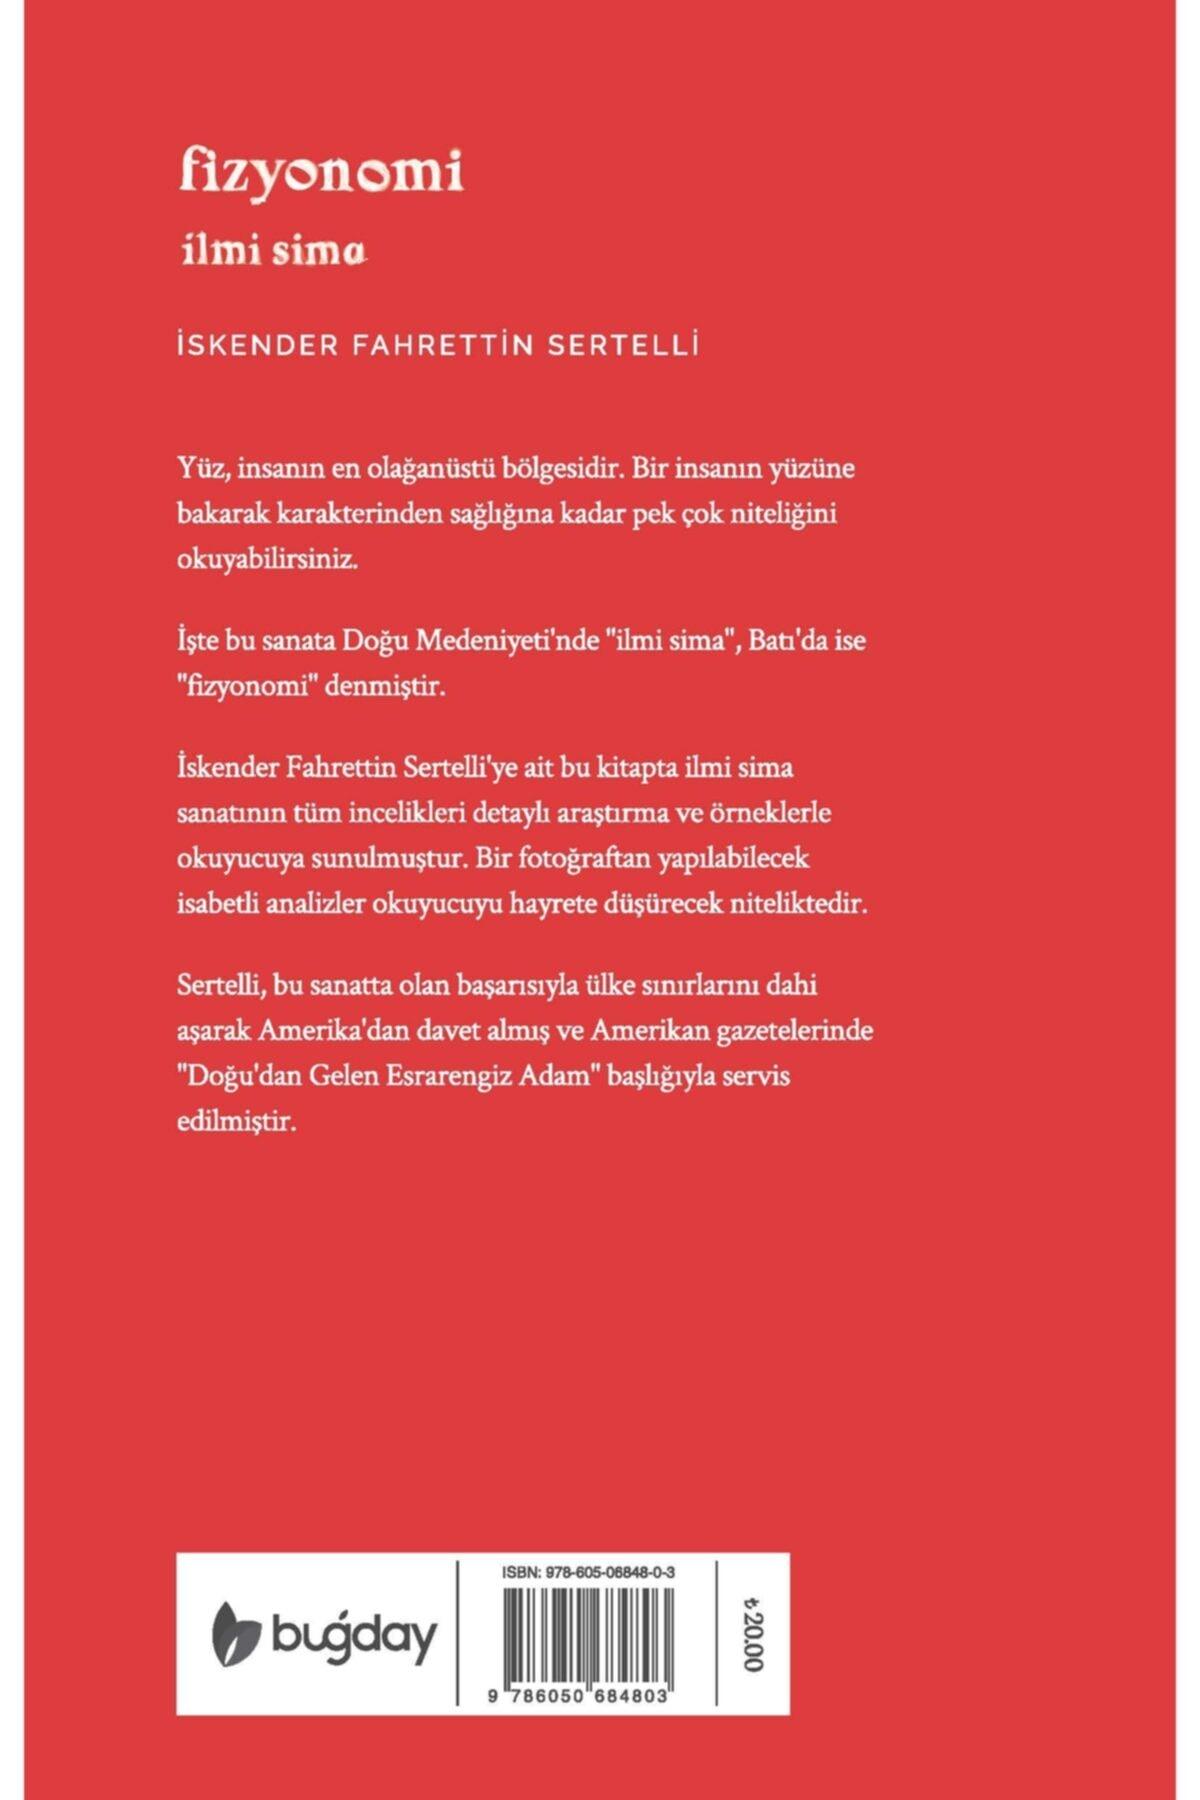 Buğday Kitap Fizyonomi Ilmi Sima - Iskender Fahrettin Sertelli 2